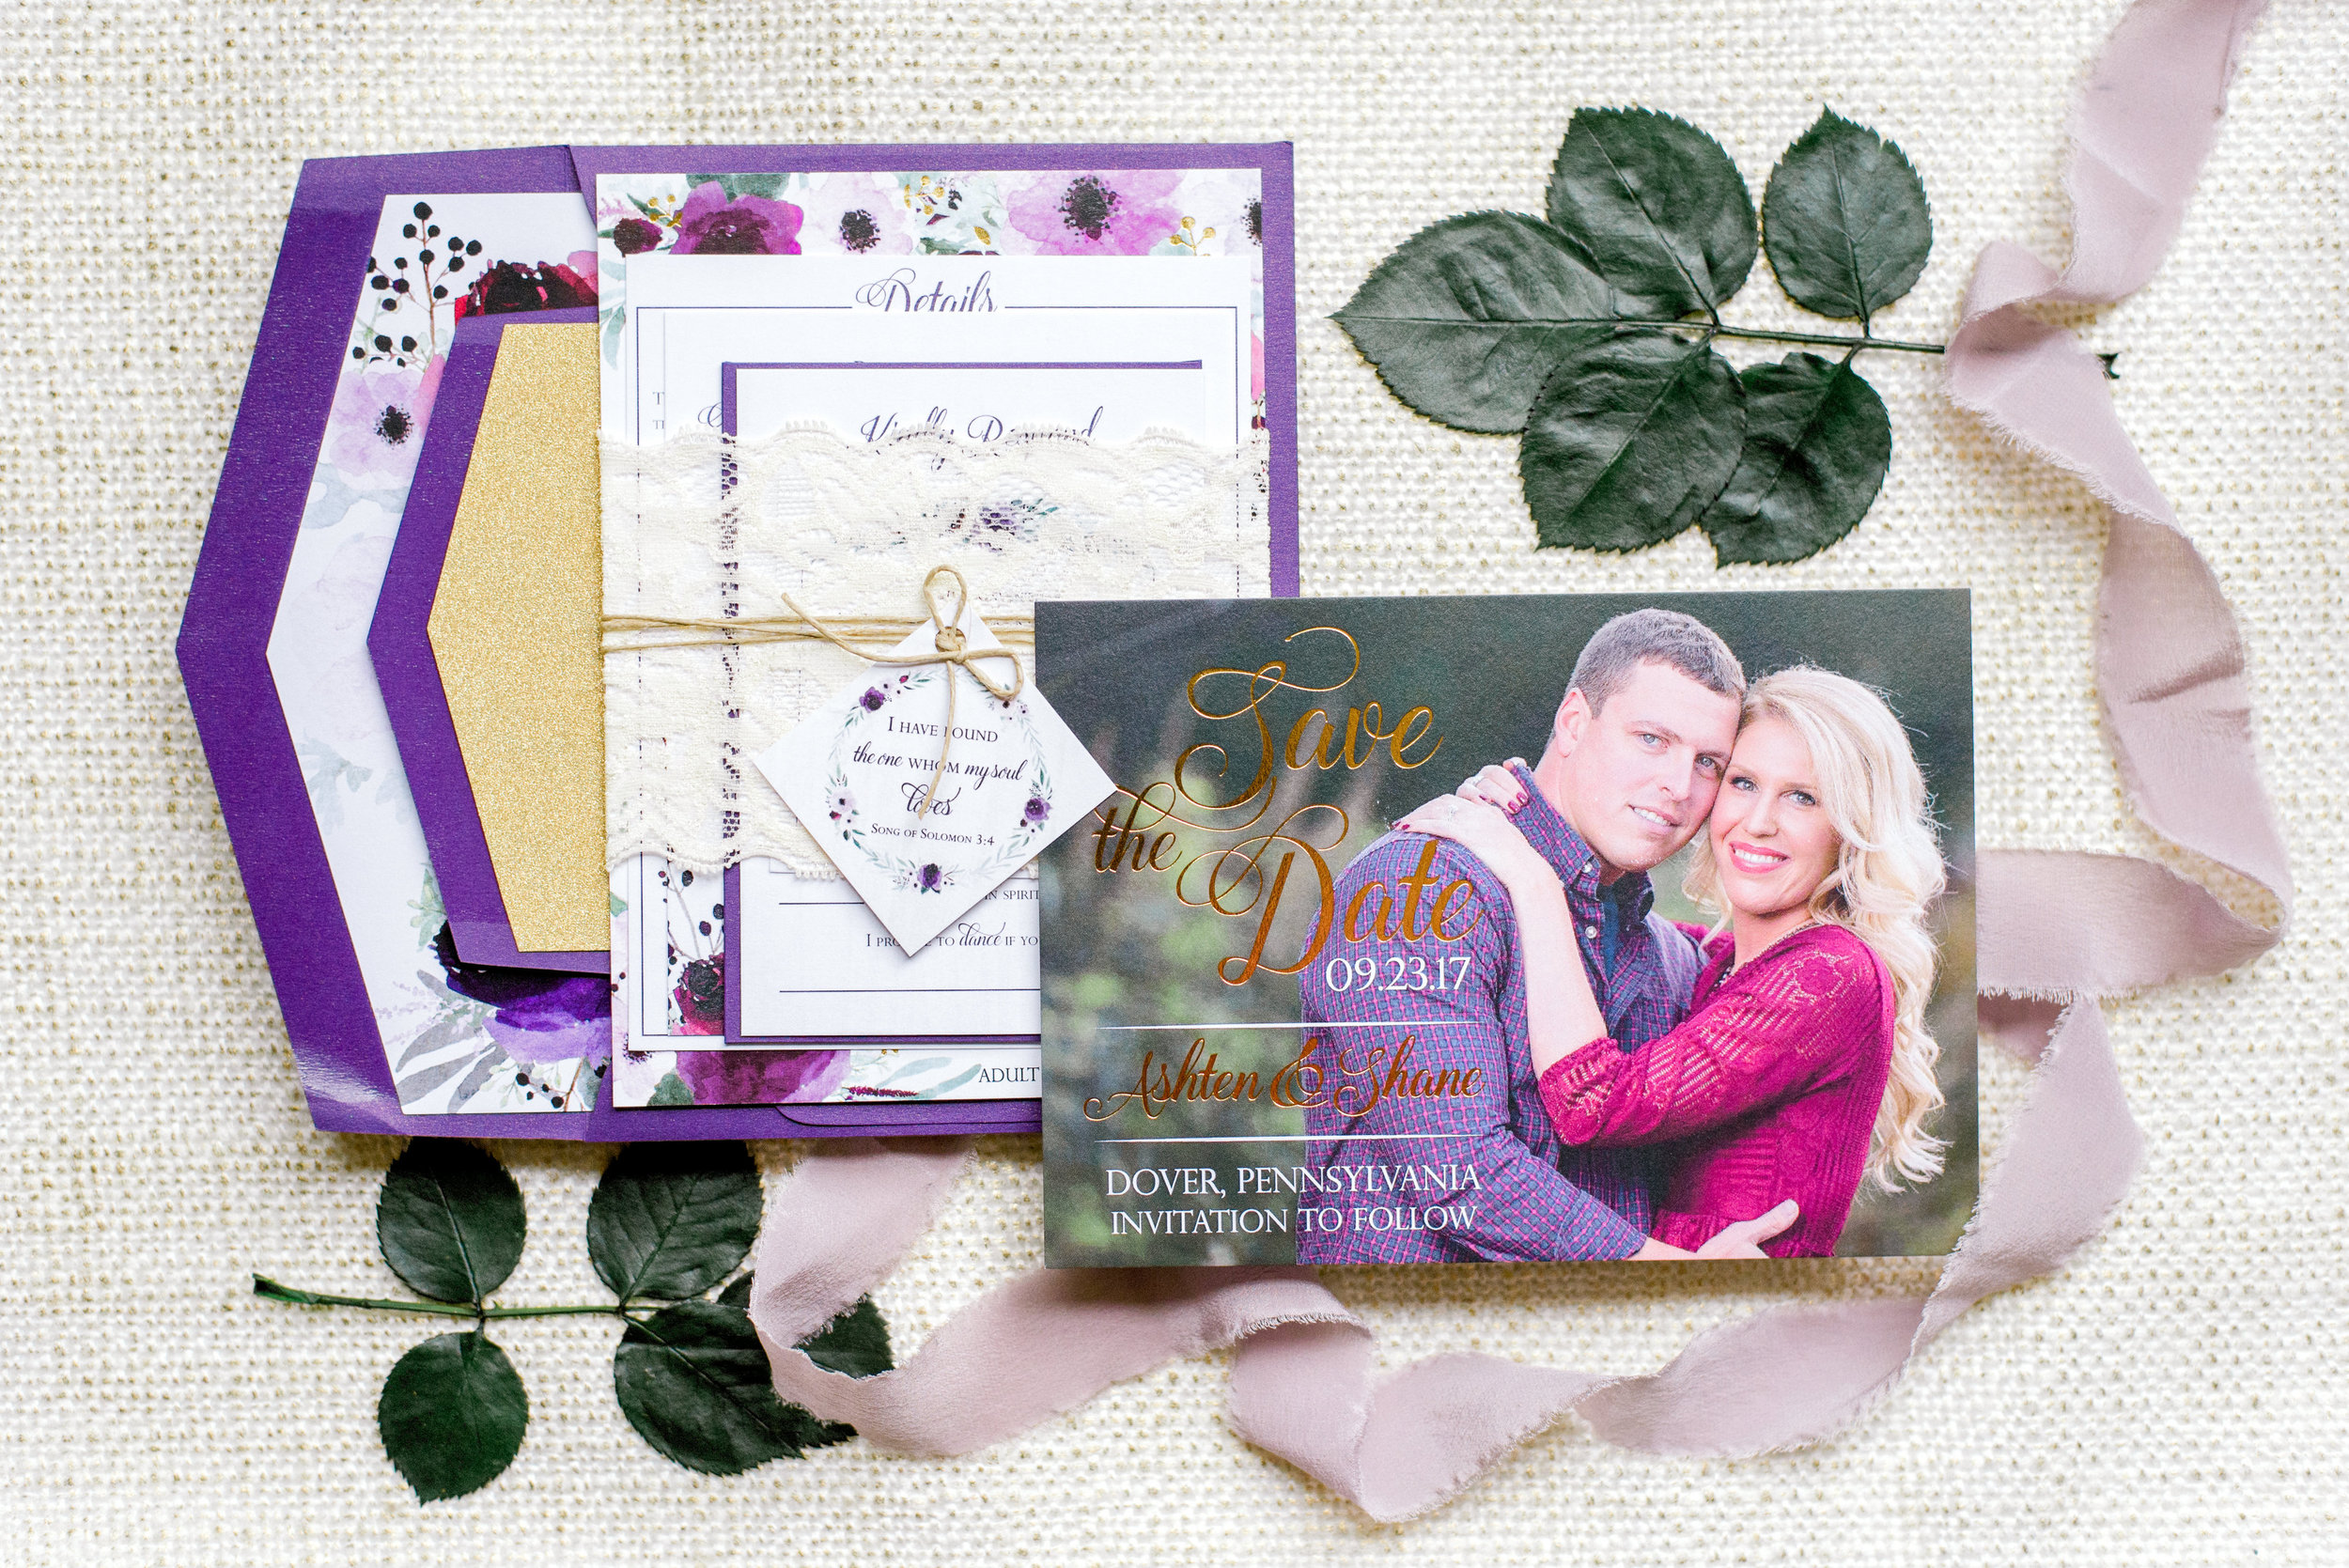 Purple Central PA, York PA, JesSmith Designs, custom, wedding, invitations, bridal, announcements, save the date, baby, hanover, calligraphy, baltimore, wedding invitations, lancaster, gettysburg Gold-0076.jpg